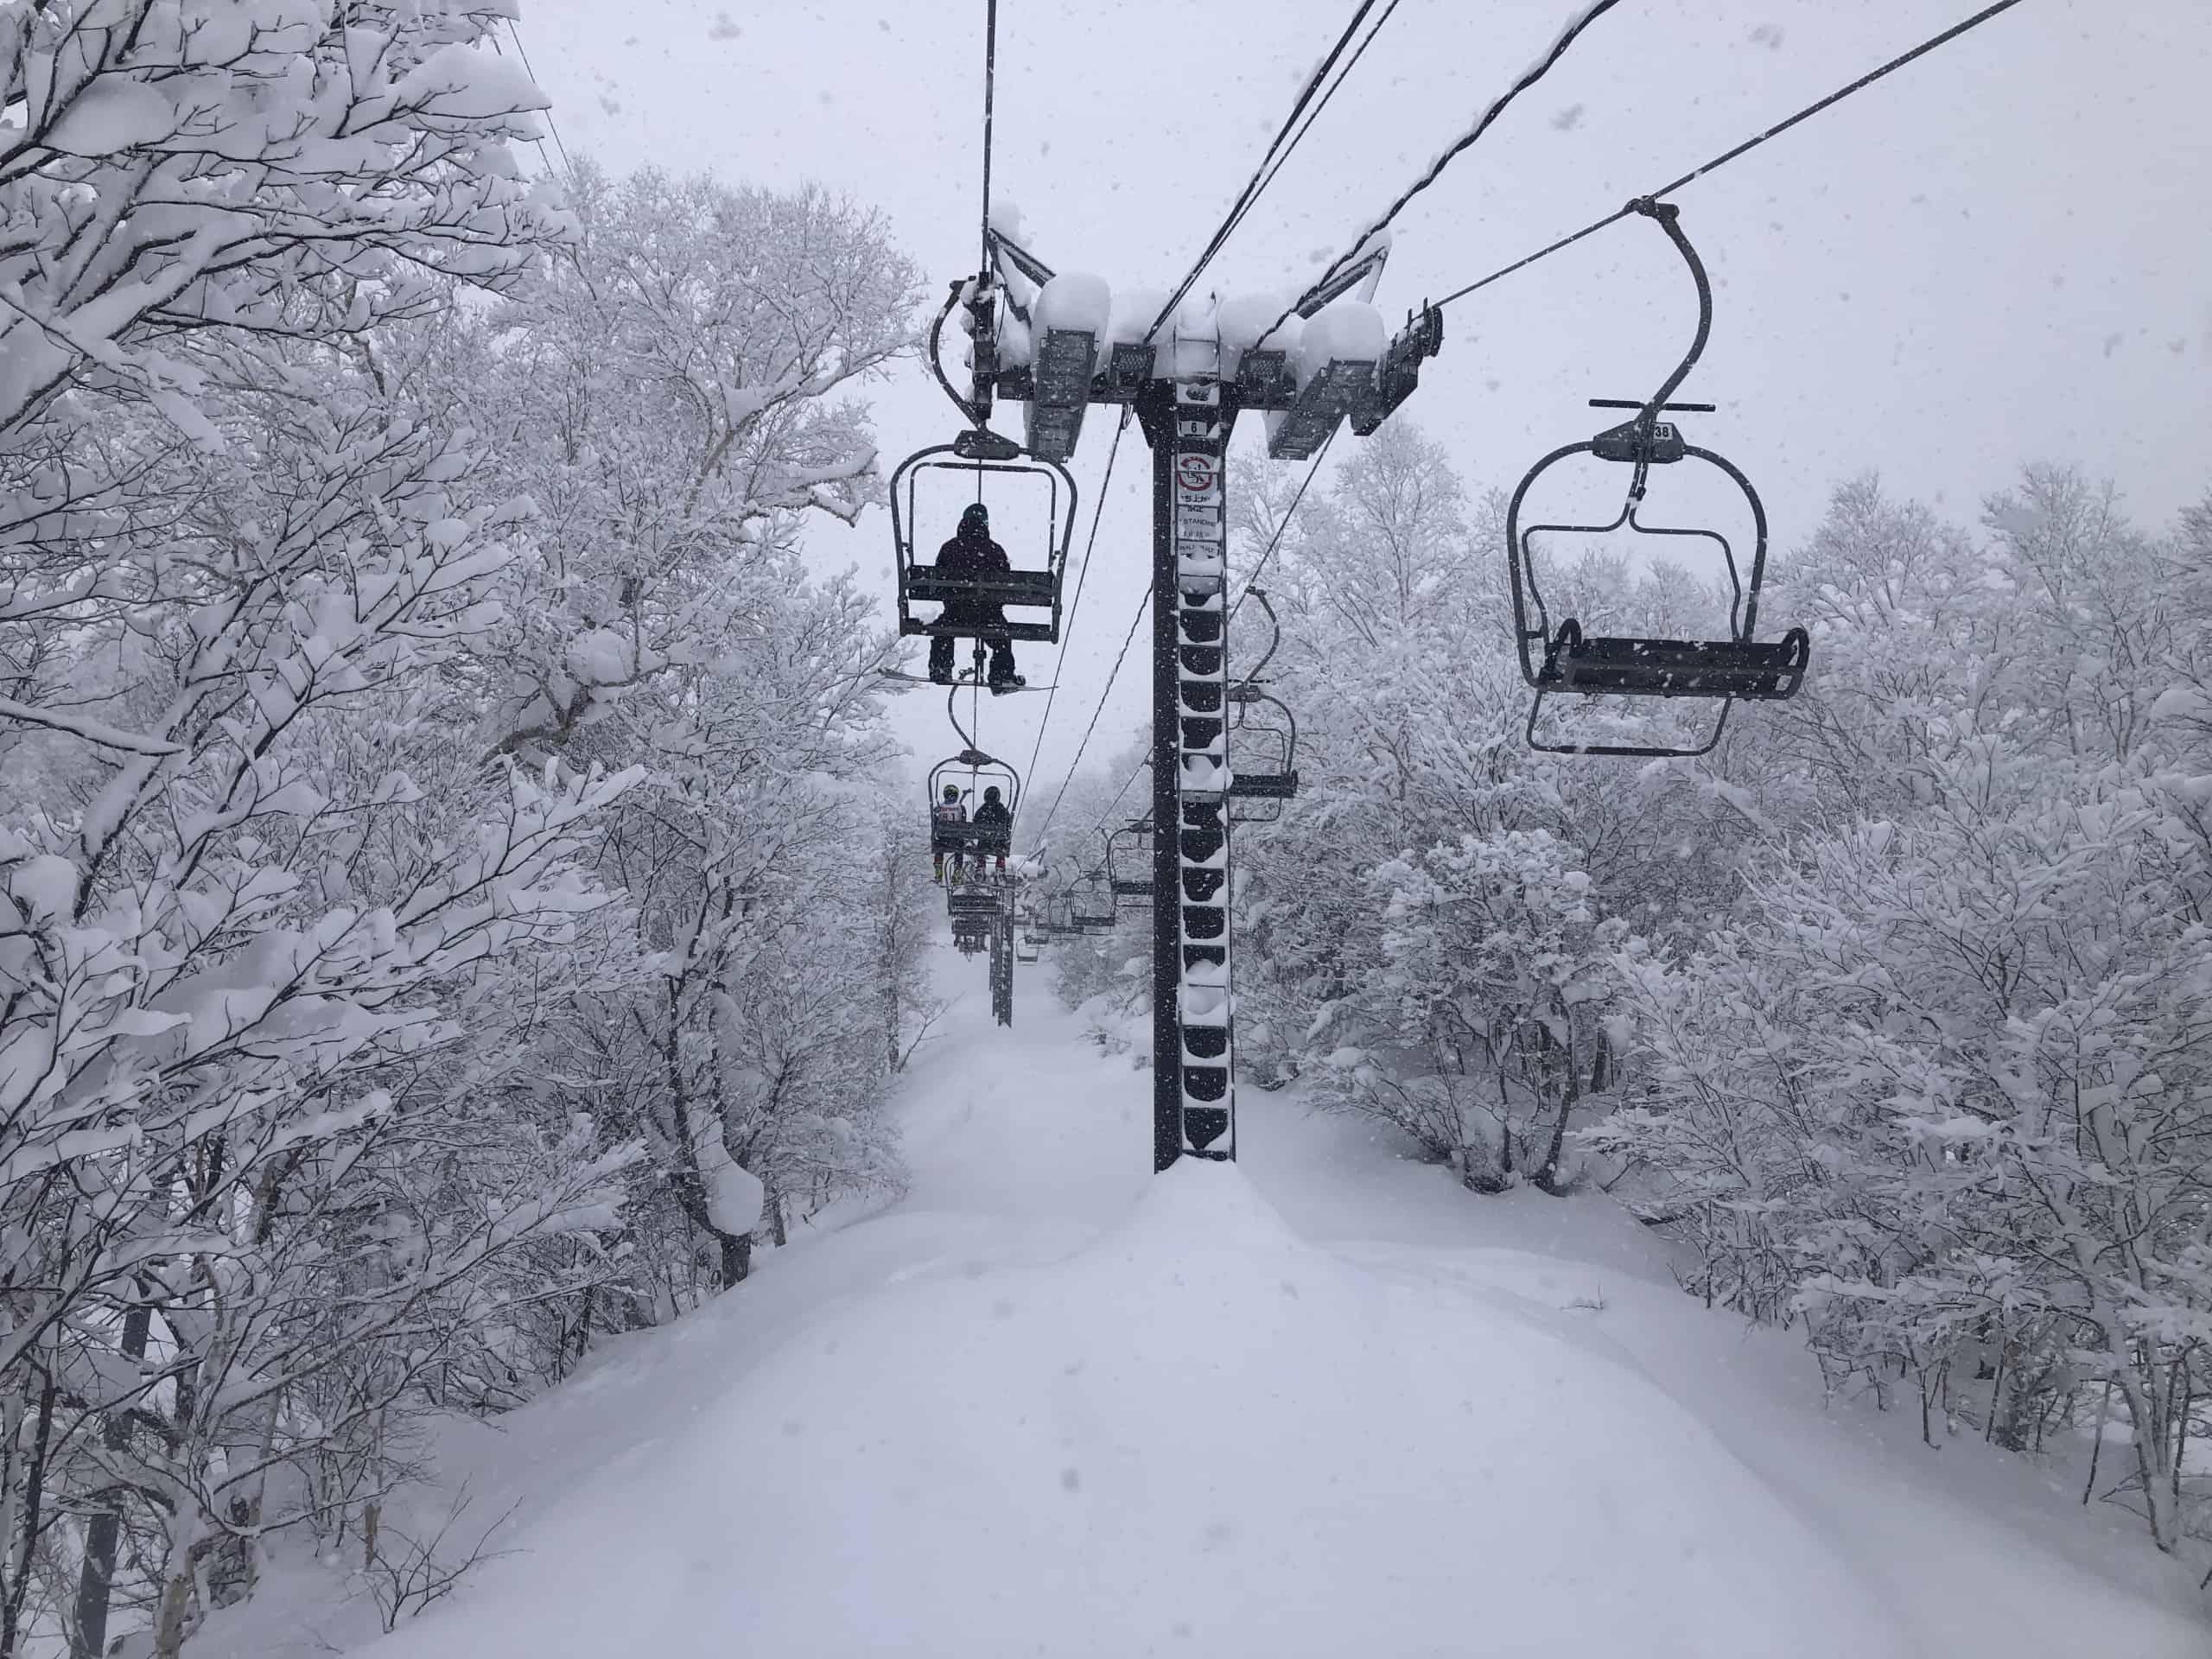 Furano Update - Powder Days But Empty Slopes Make It Feel Like a Meditation Retreat